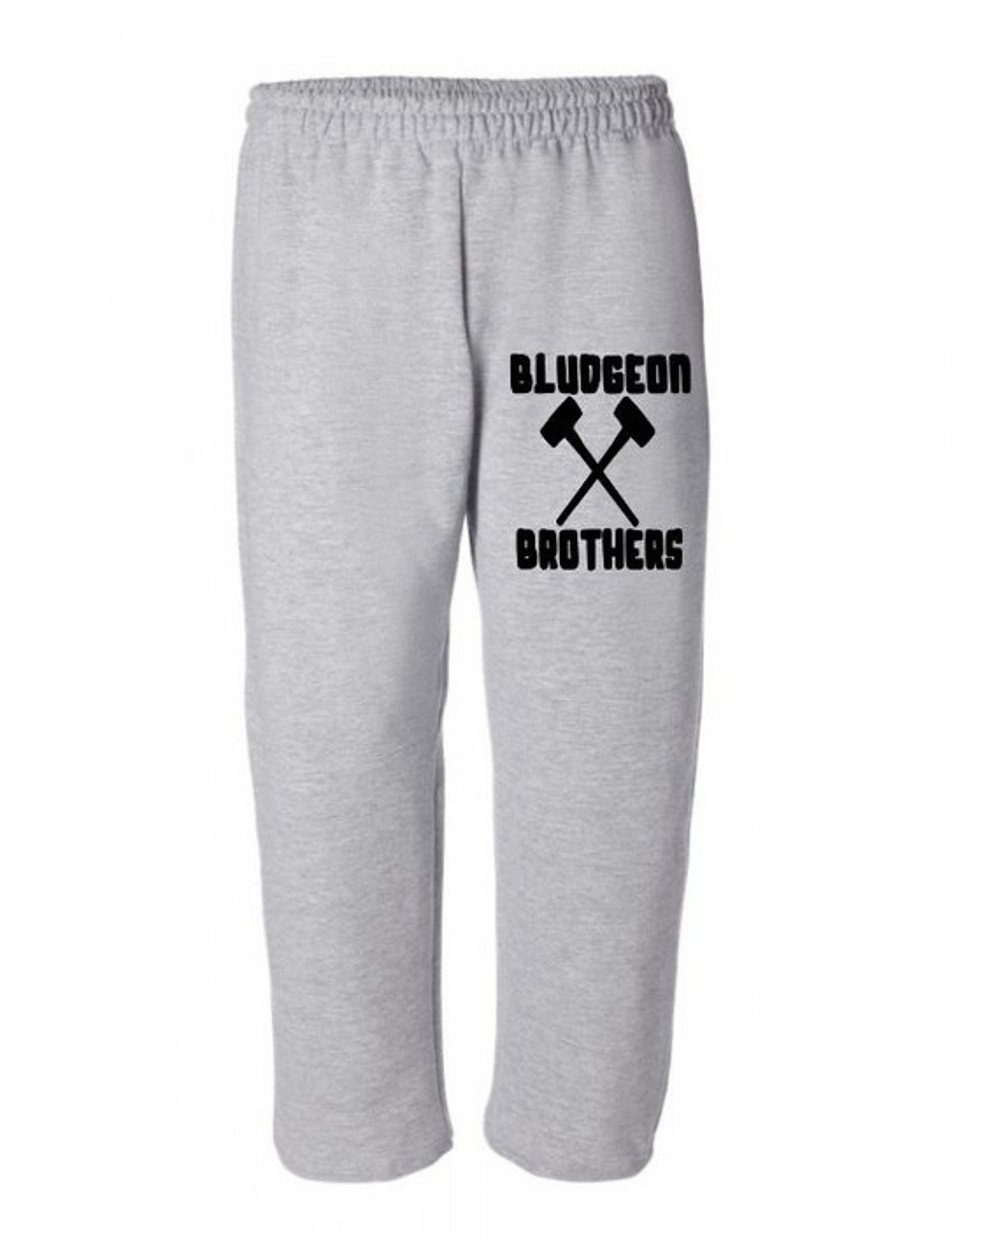 Squared Circle Bludgeon Brothers Rowan Harper WWE Kids Youth Sweatpants (Small, Grey)